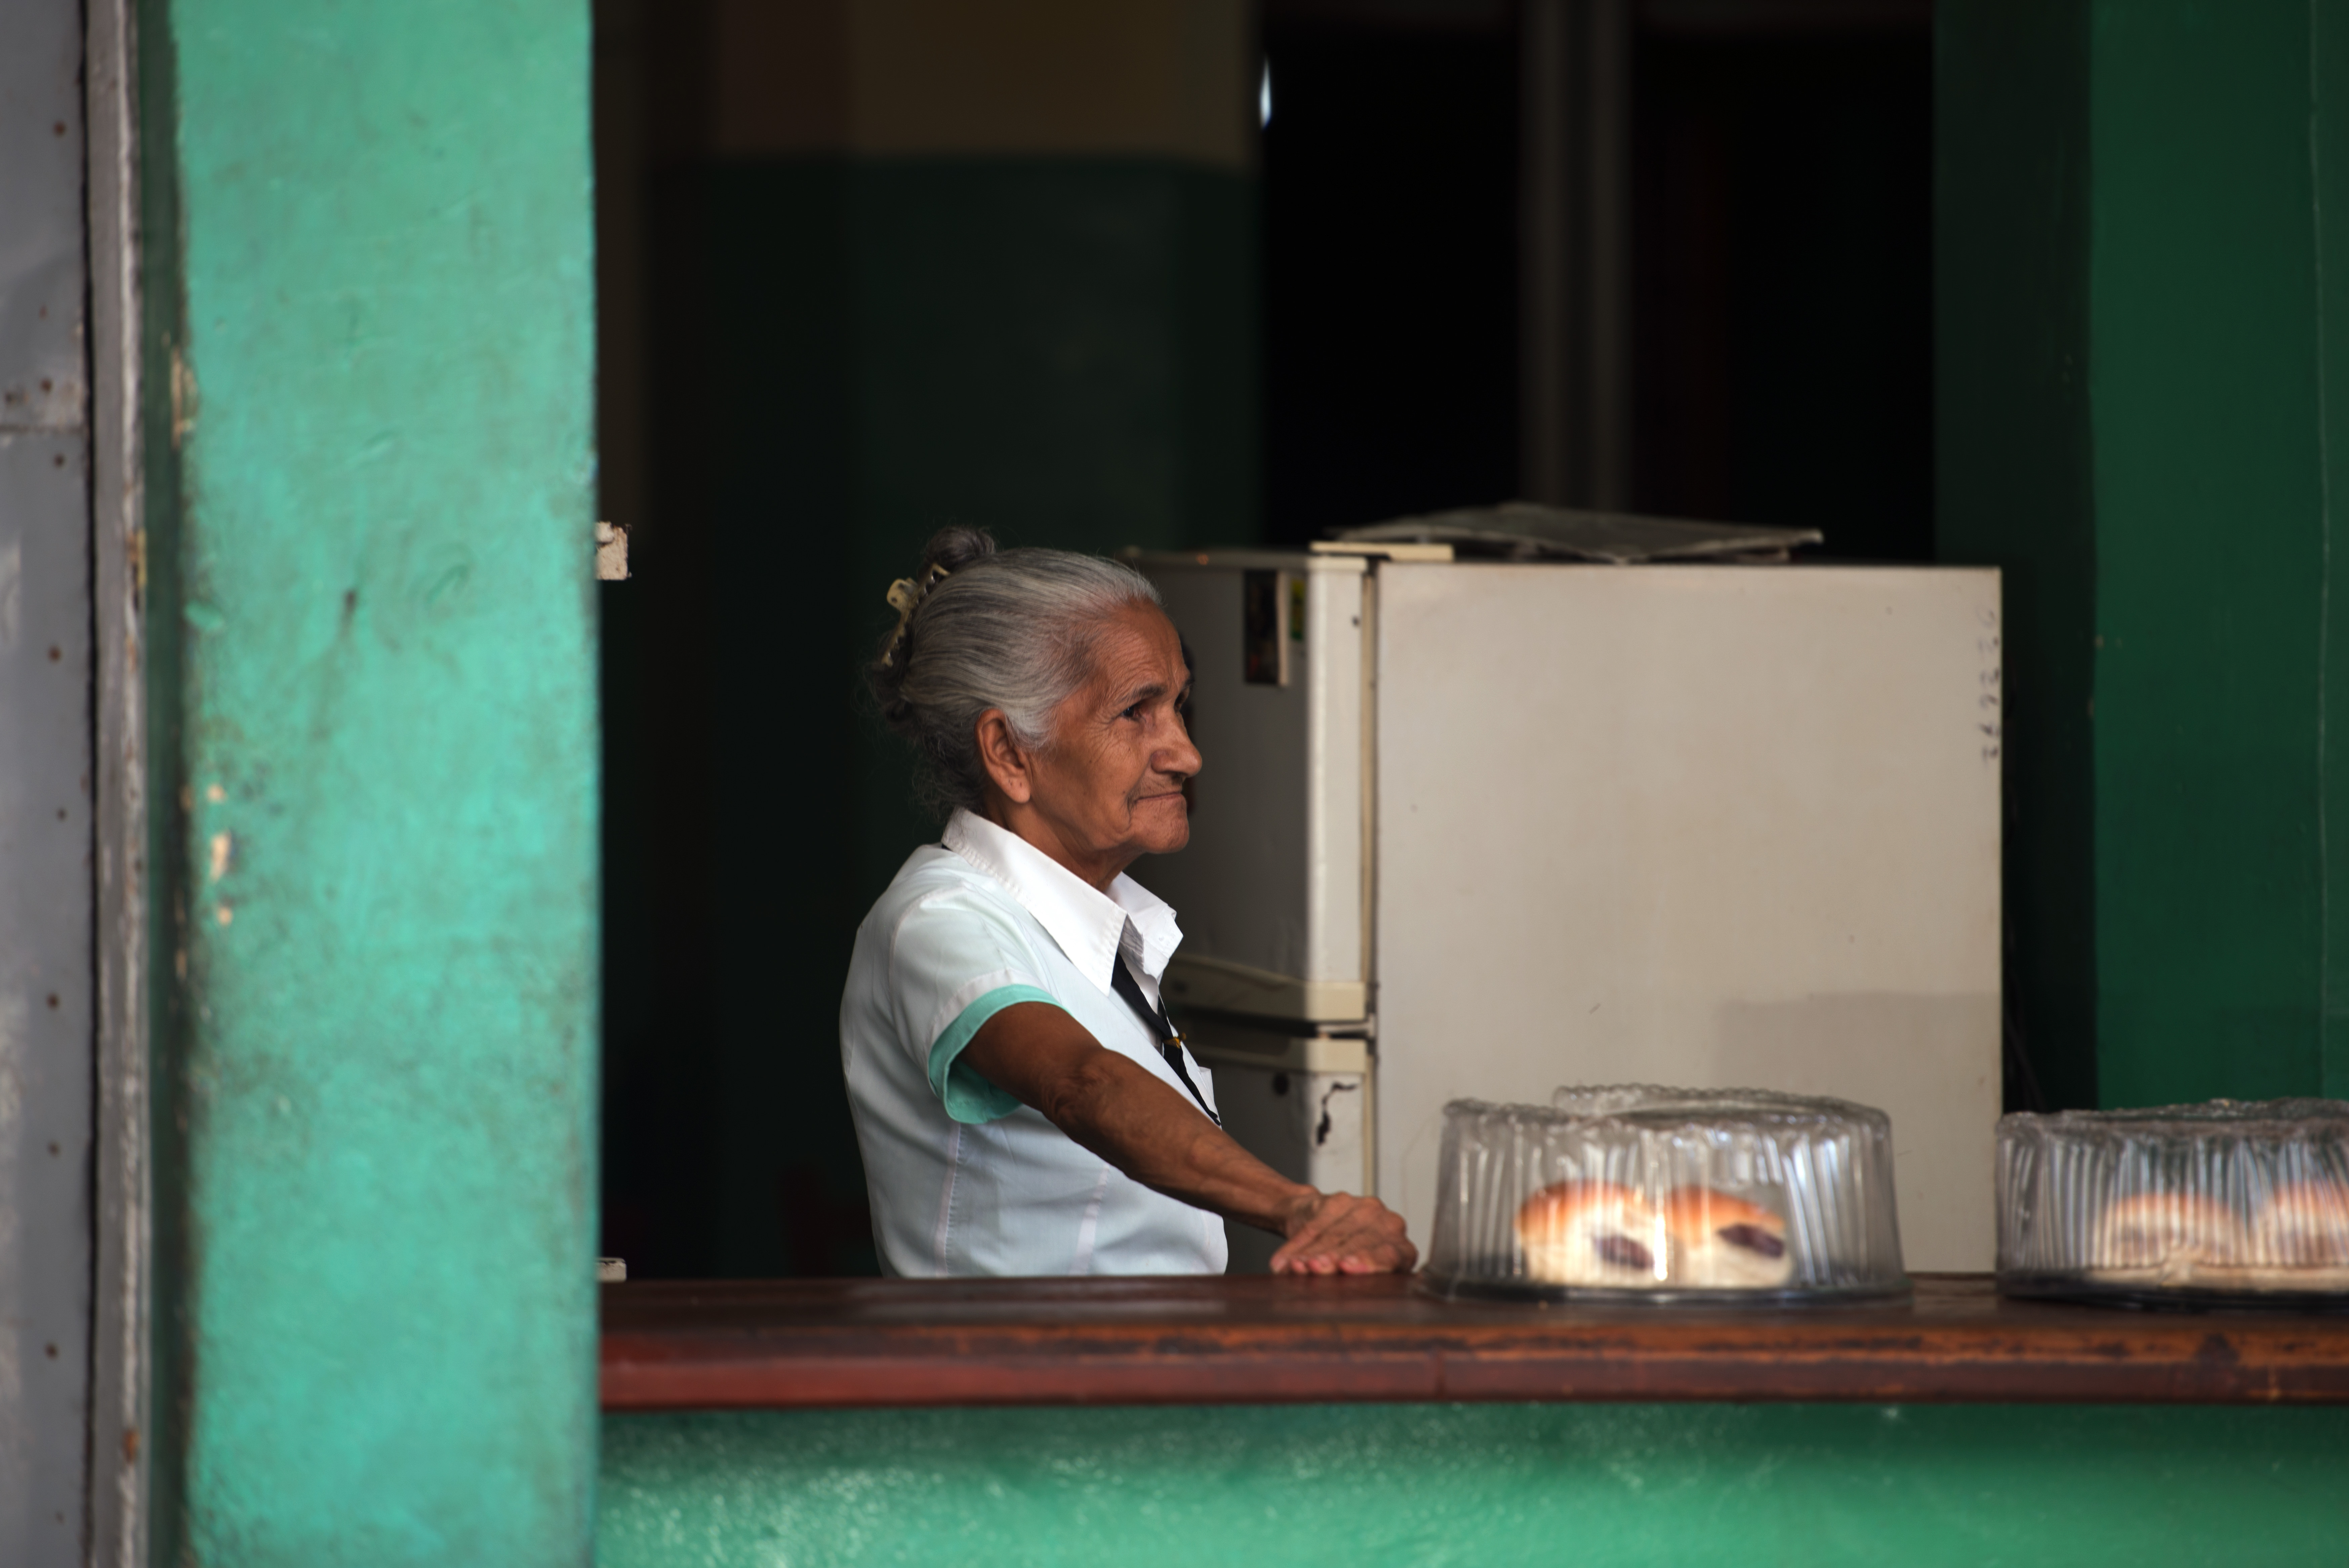 Habana cookie shop